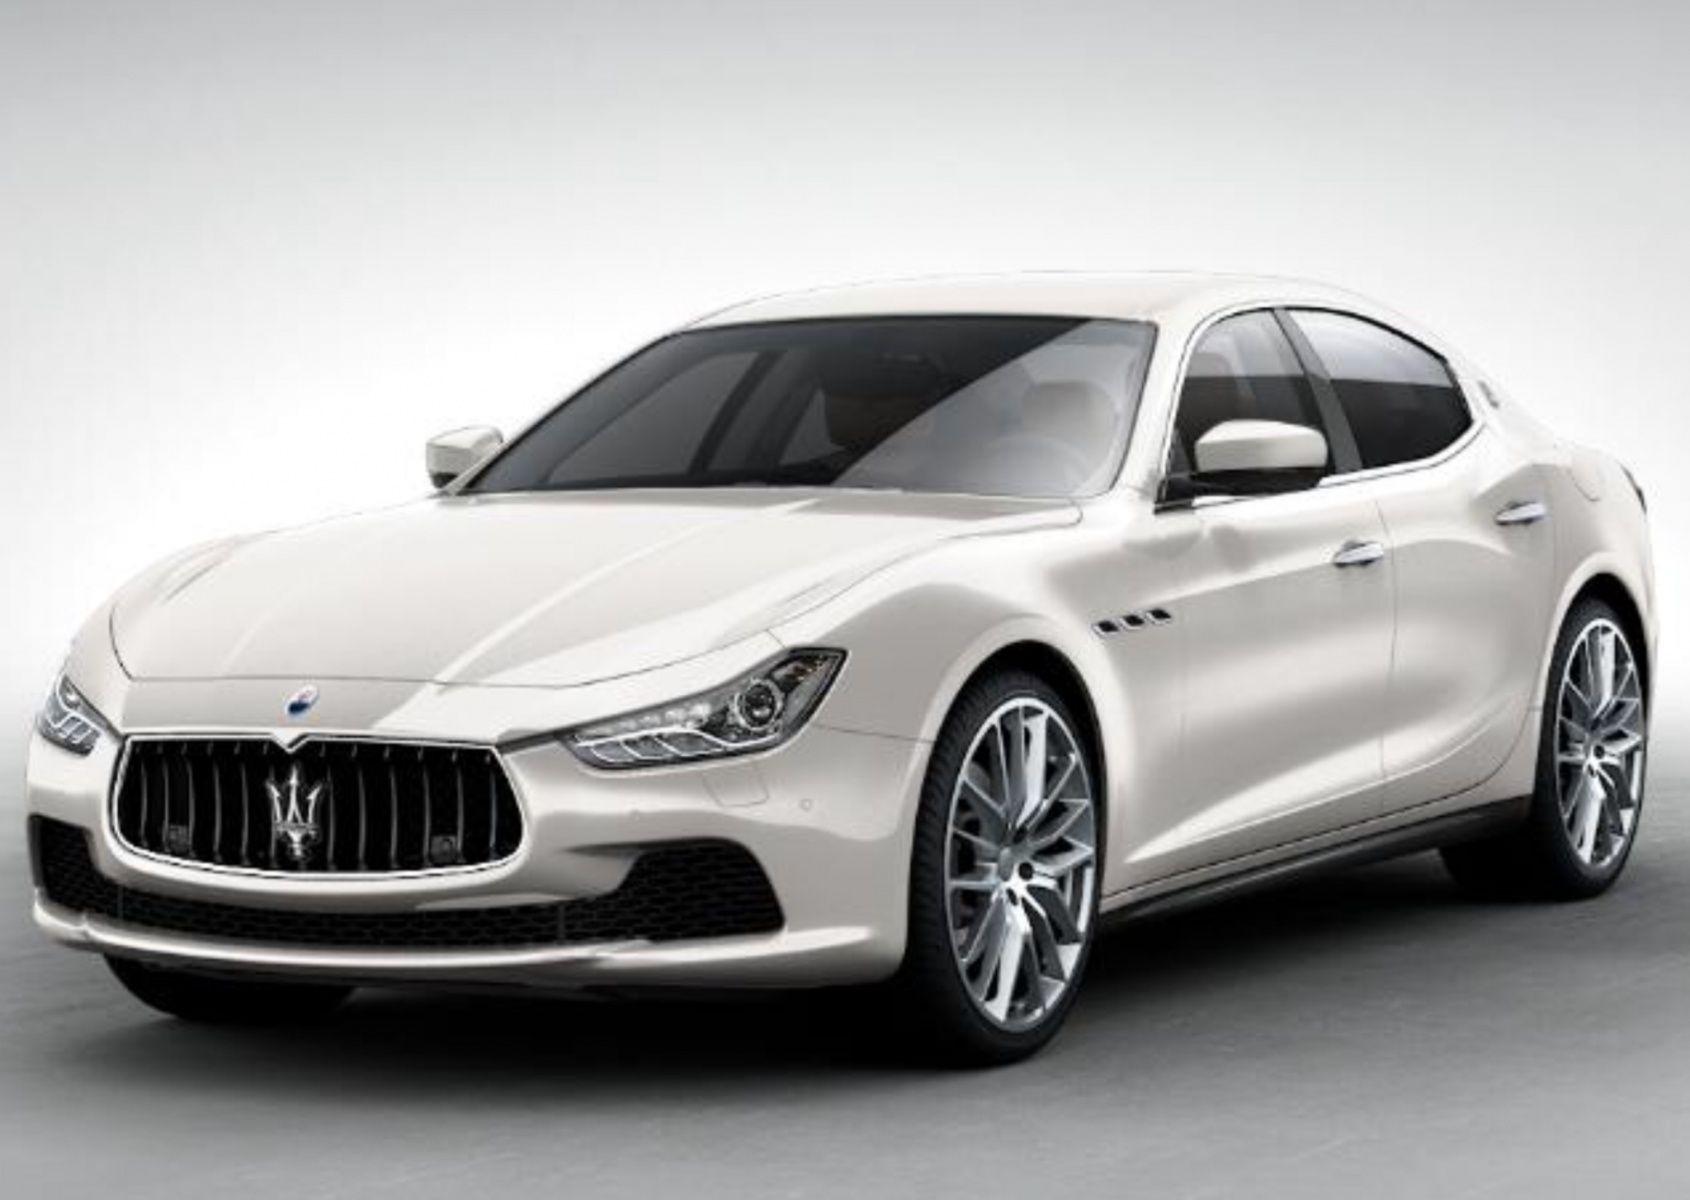 2017 Maserati Ghibli Diesel MY 17 Classic Driver